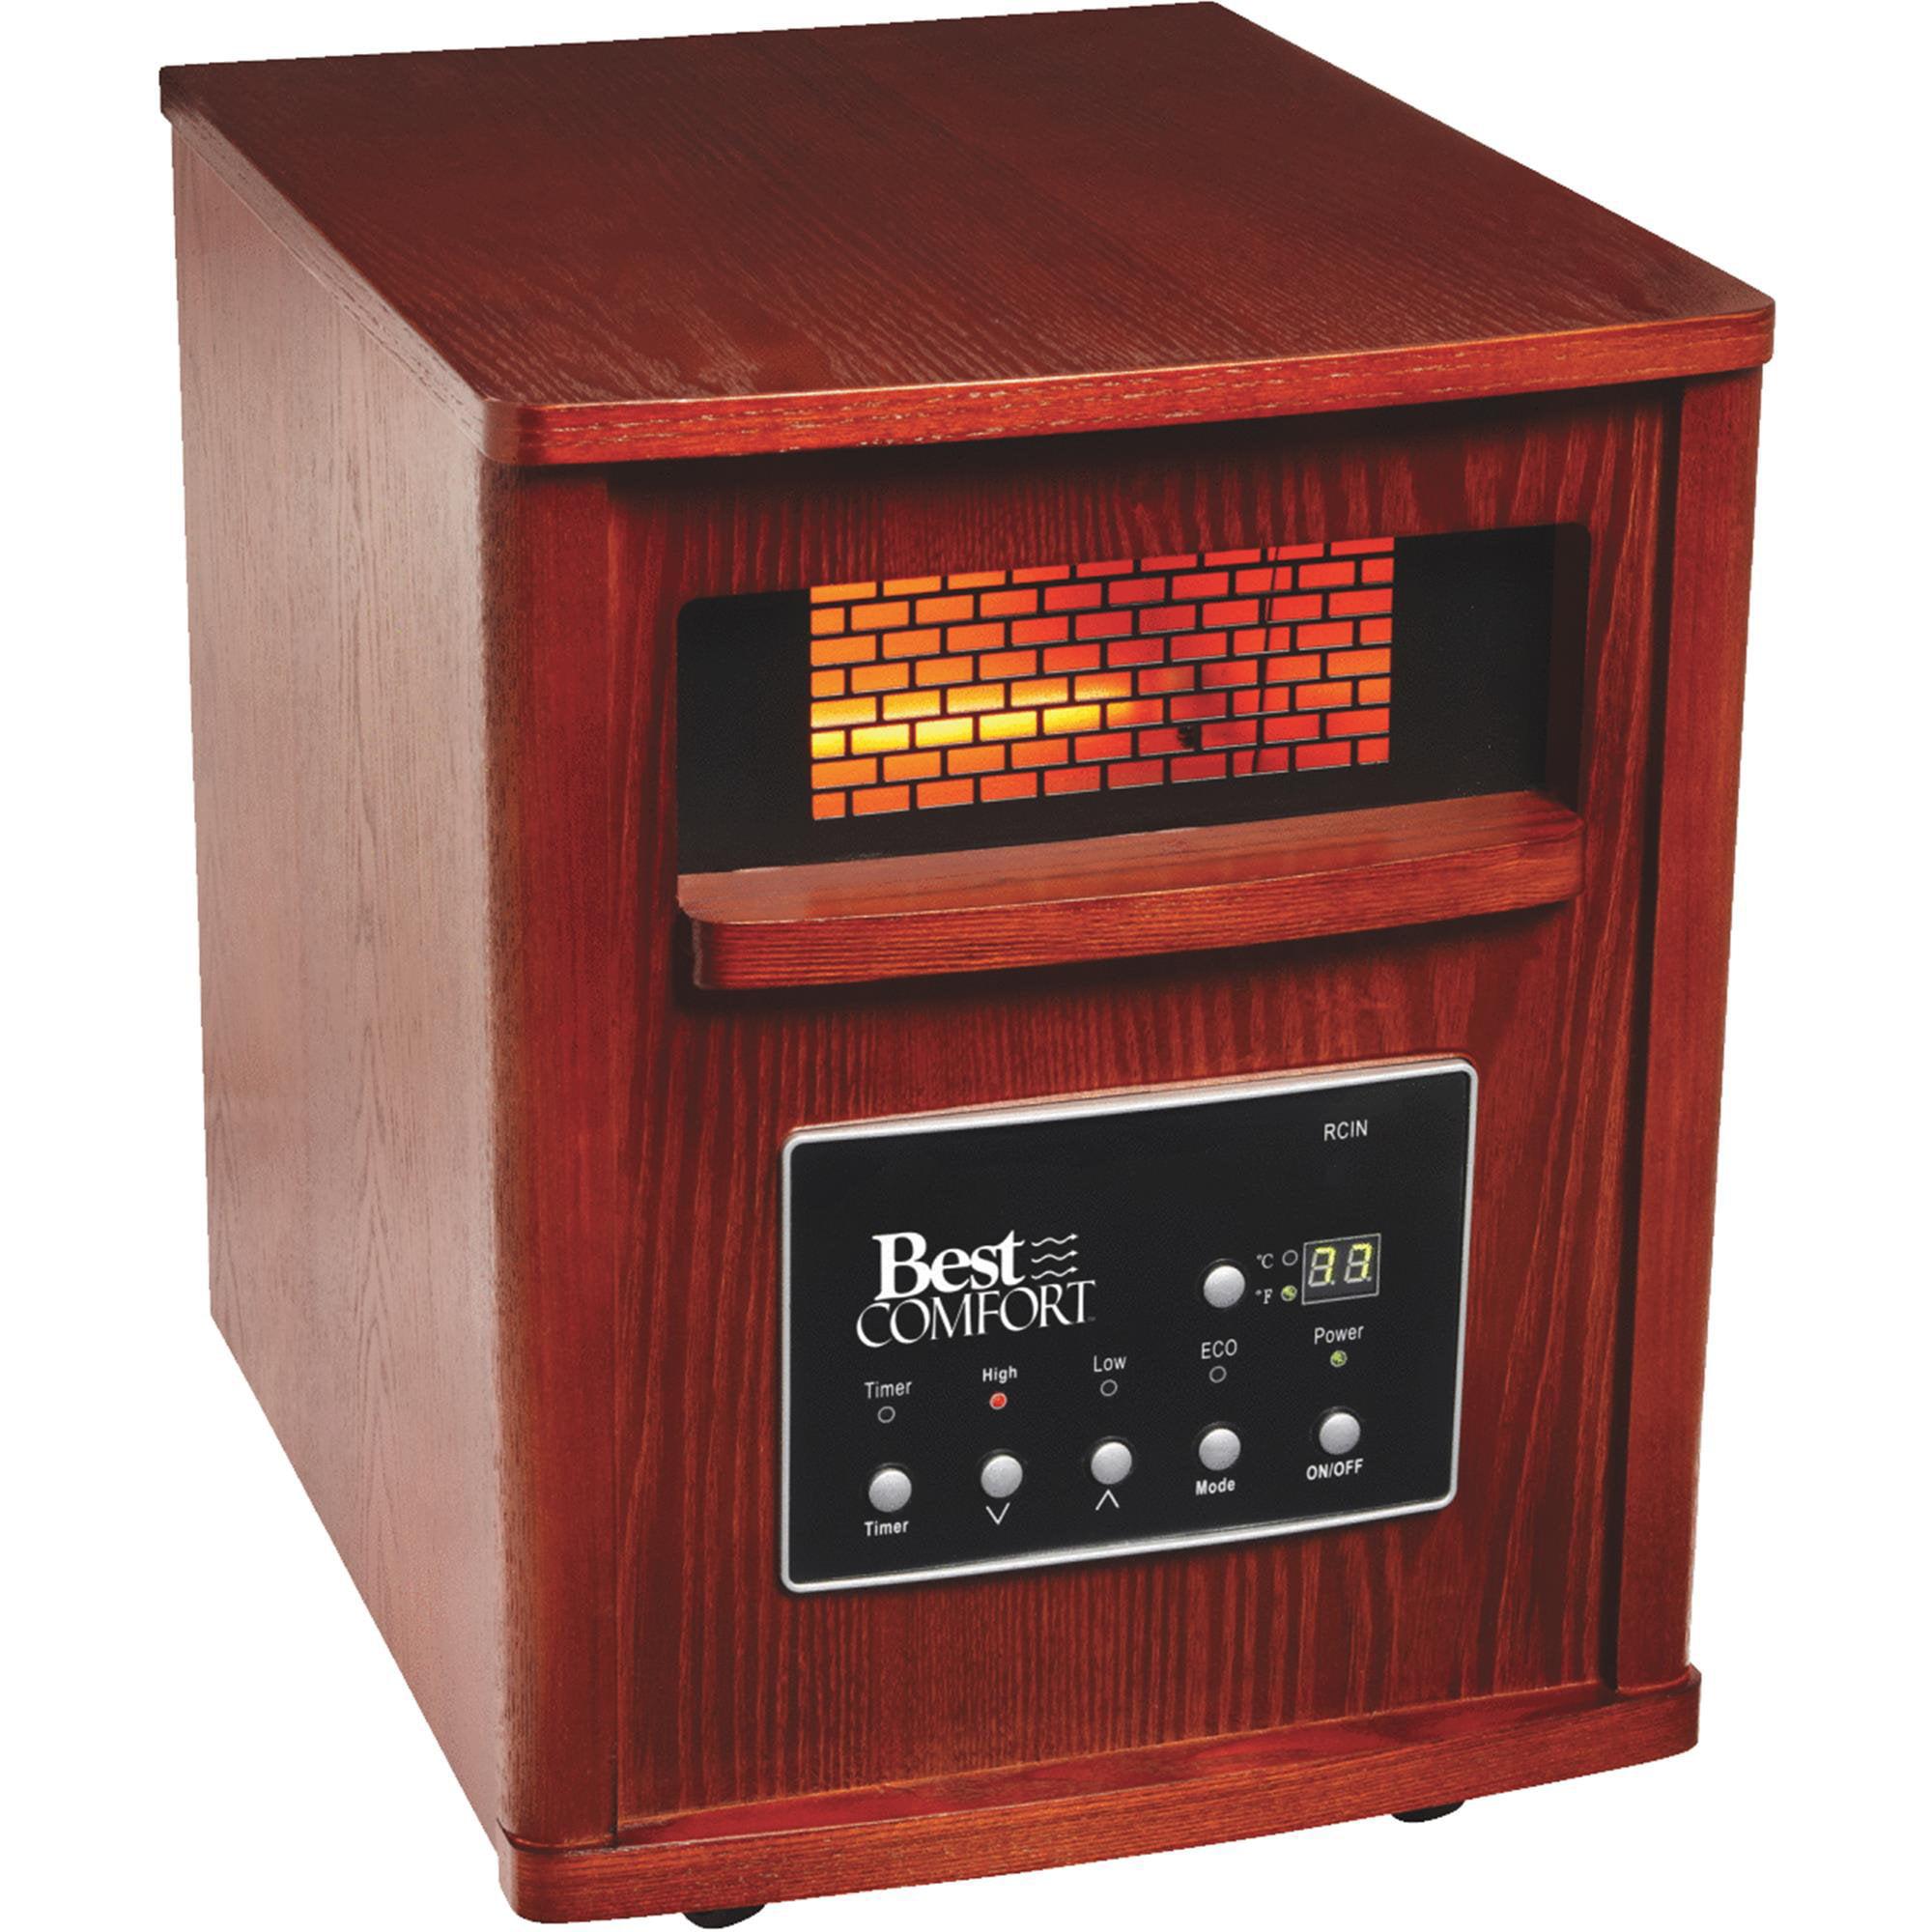 Do It Best Best Comfort Quartz Heater with Woodgrain Cabinet